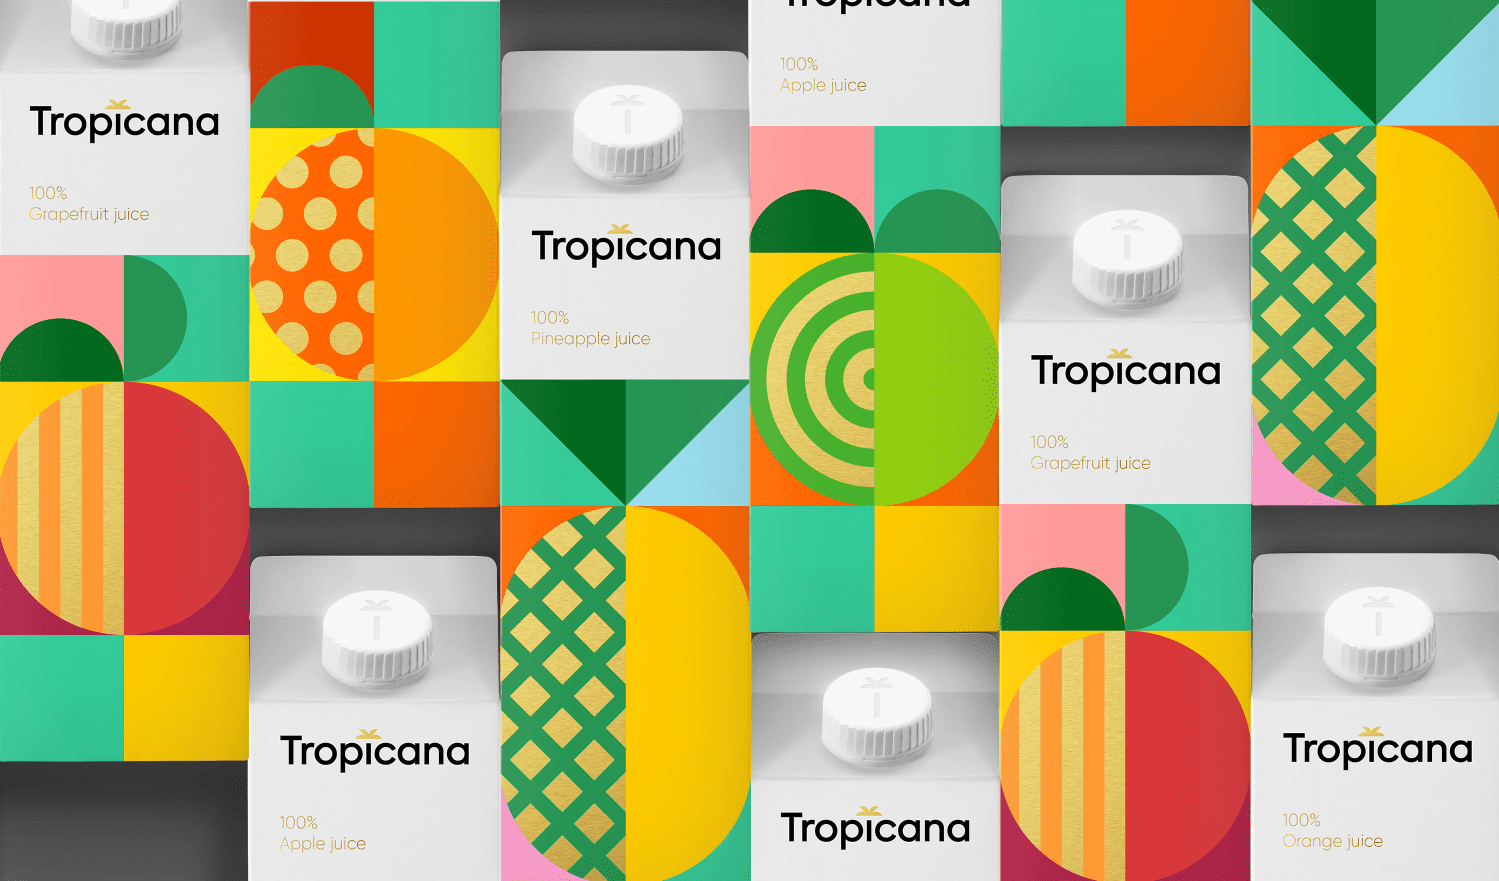 Tropicana 19 - Ach, tie obaly – Tropicana koncept